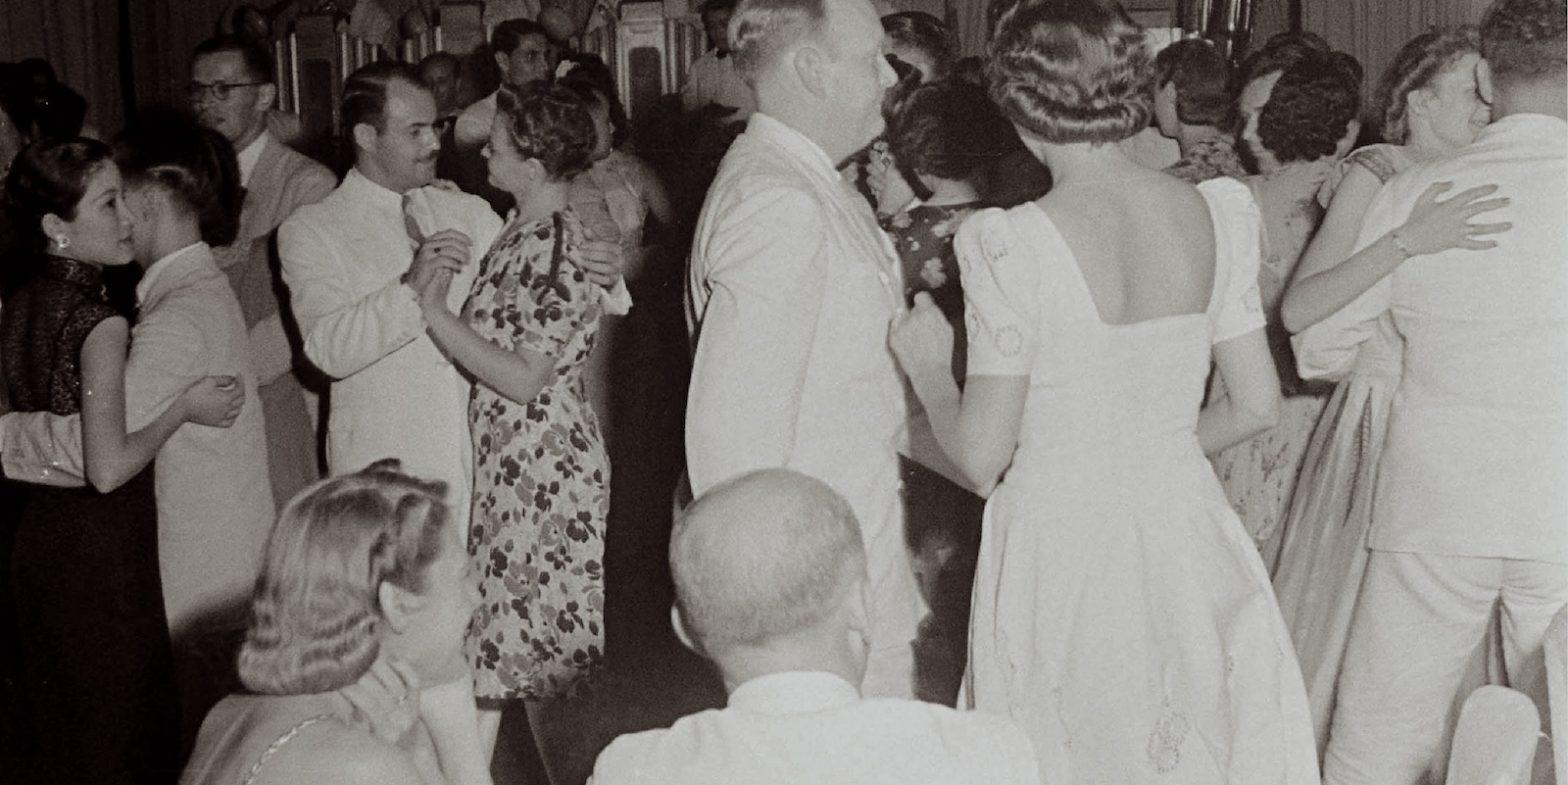 Танцующая публика в шанхайском кабаре (с) (с) A. T. Hull Jr.